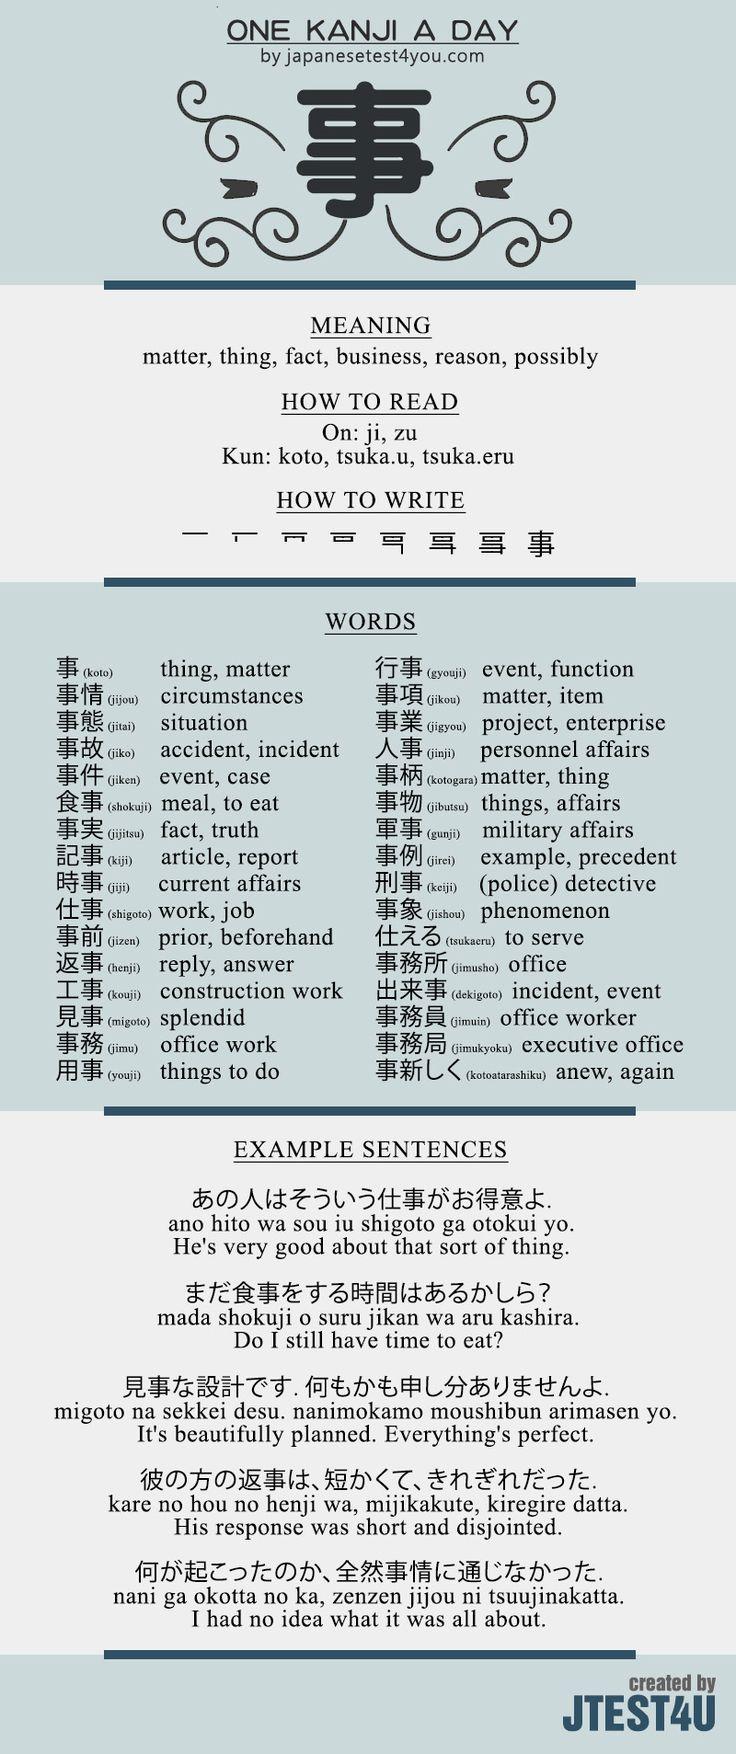 Learn one Kanji a day with infographic - 事 (ji): http://japanesetest4you.com/learn-one-kanji-a-day-with-infographic-%e4%ba%8b-ji/